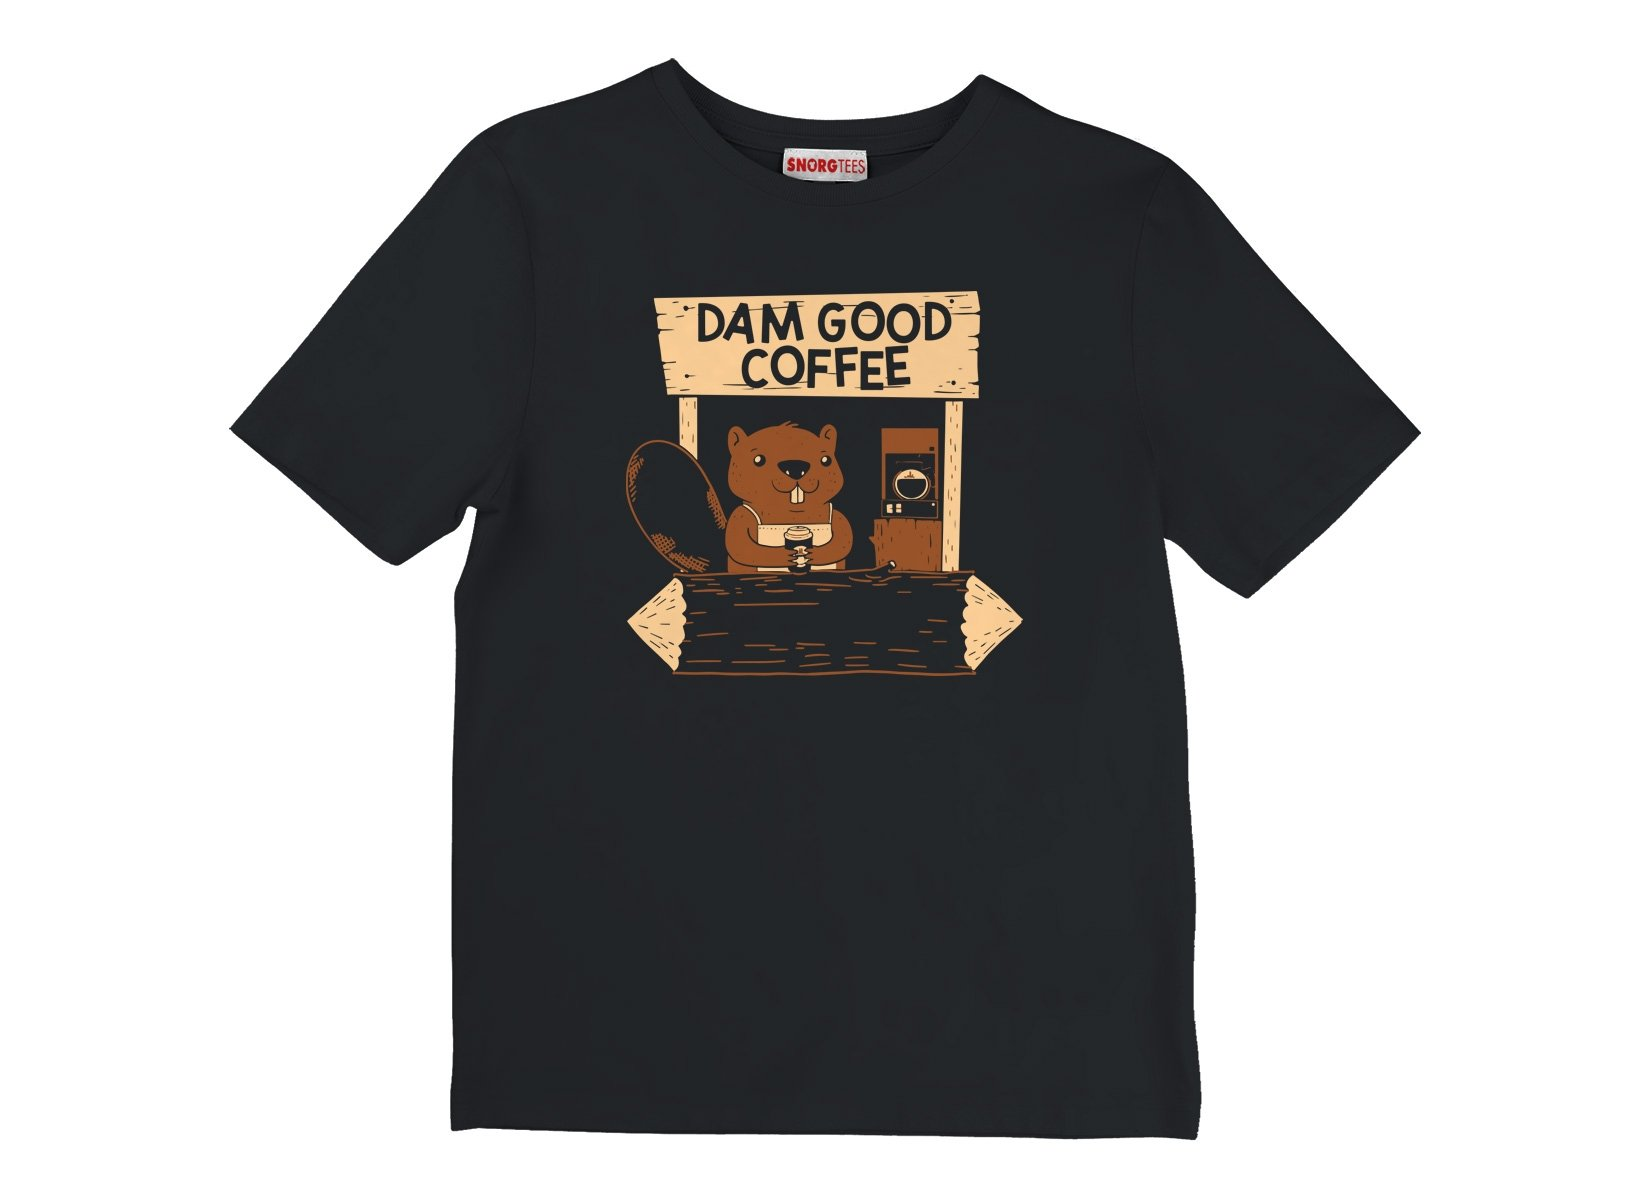 Dam Good Coffee on Kids T-Shirt